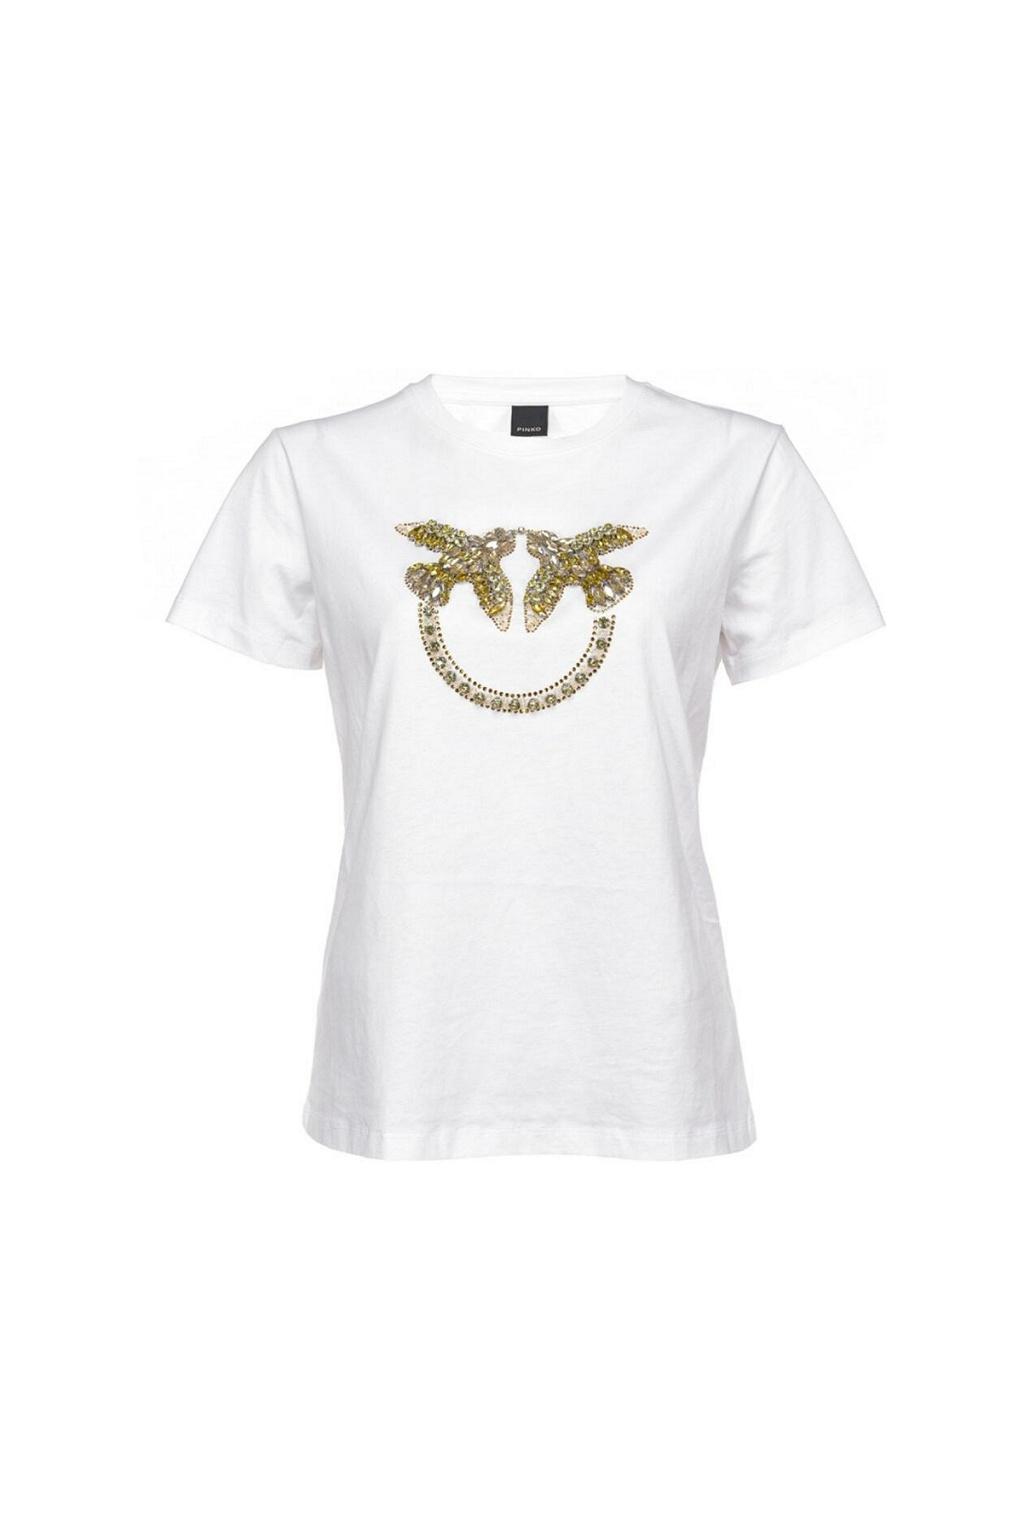 1G1610 Y4LX LZC Dámské tričko Pinko Quentin bílé